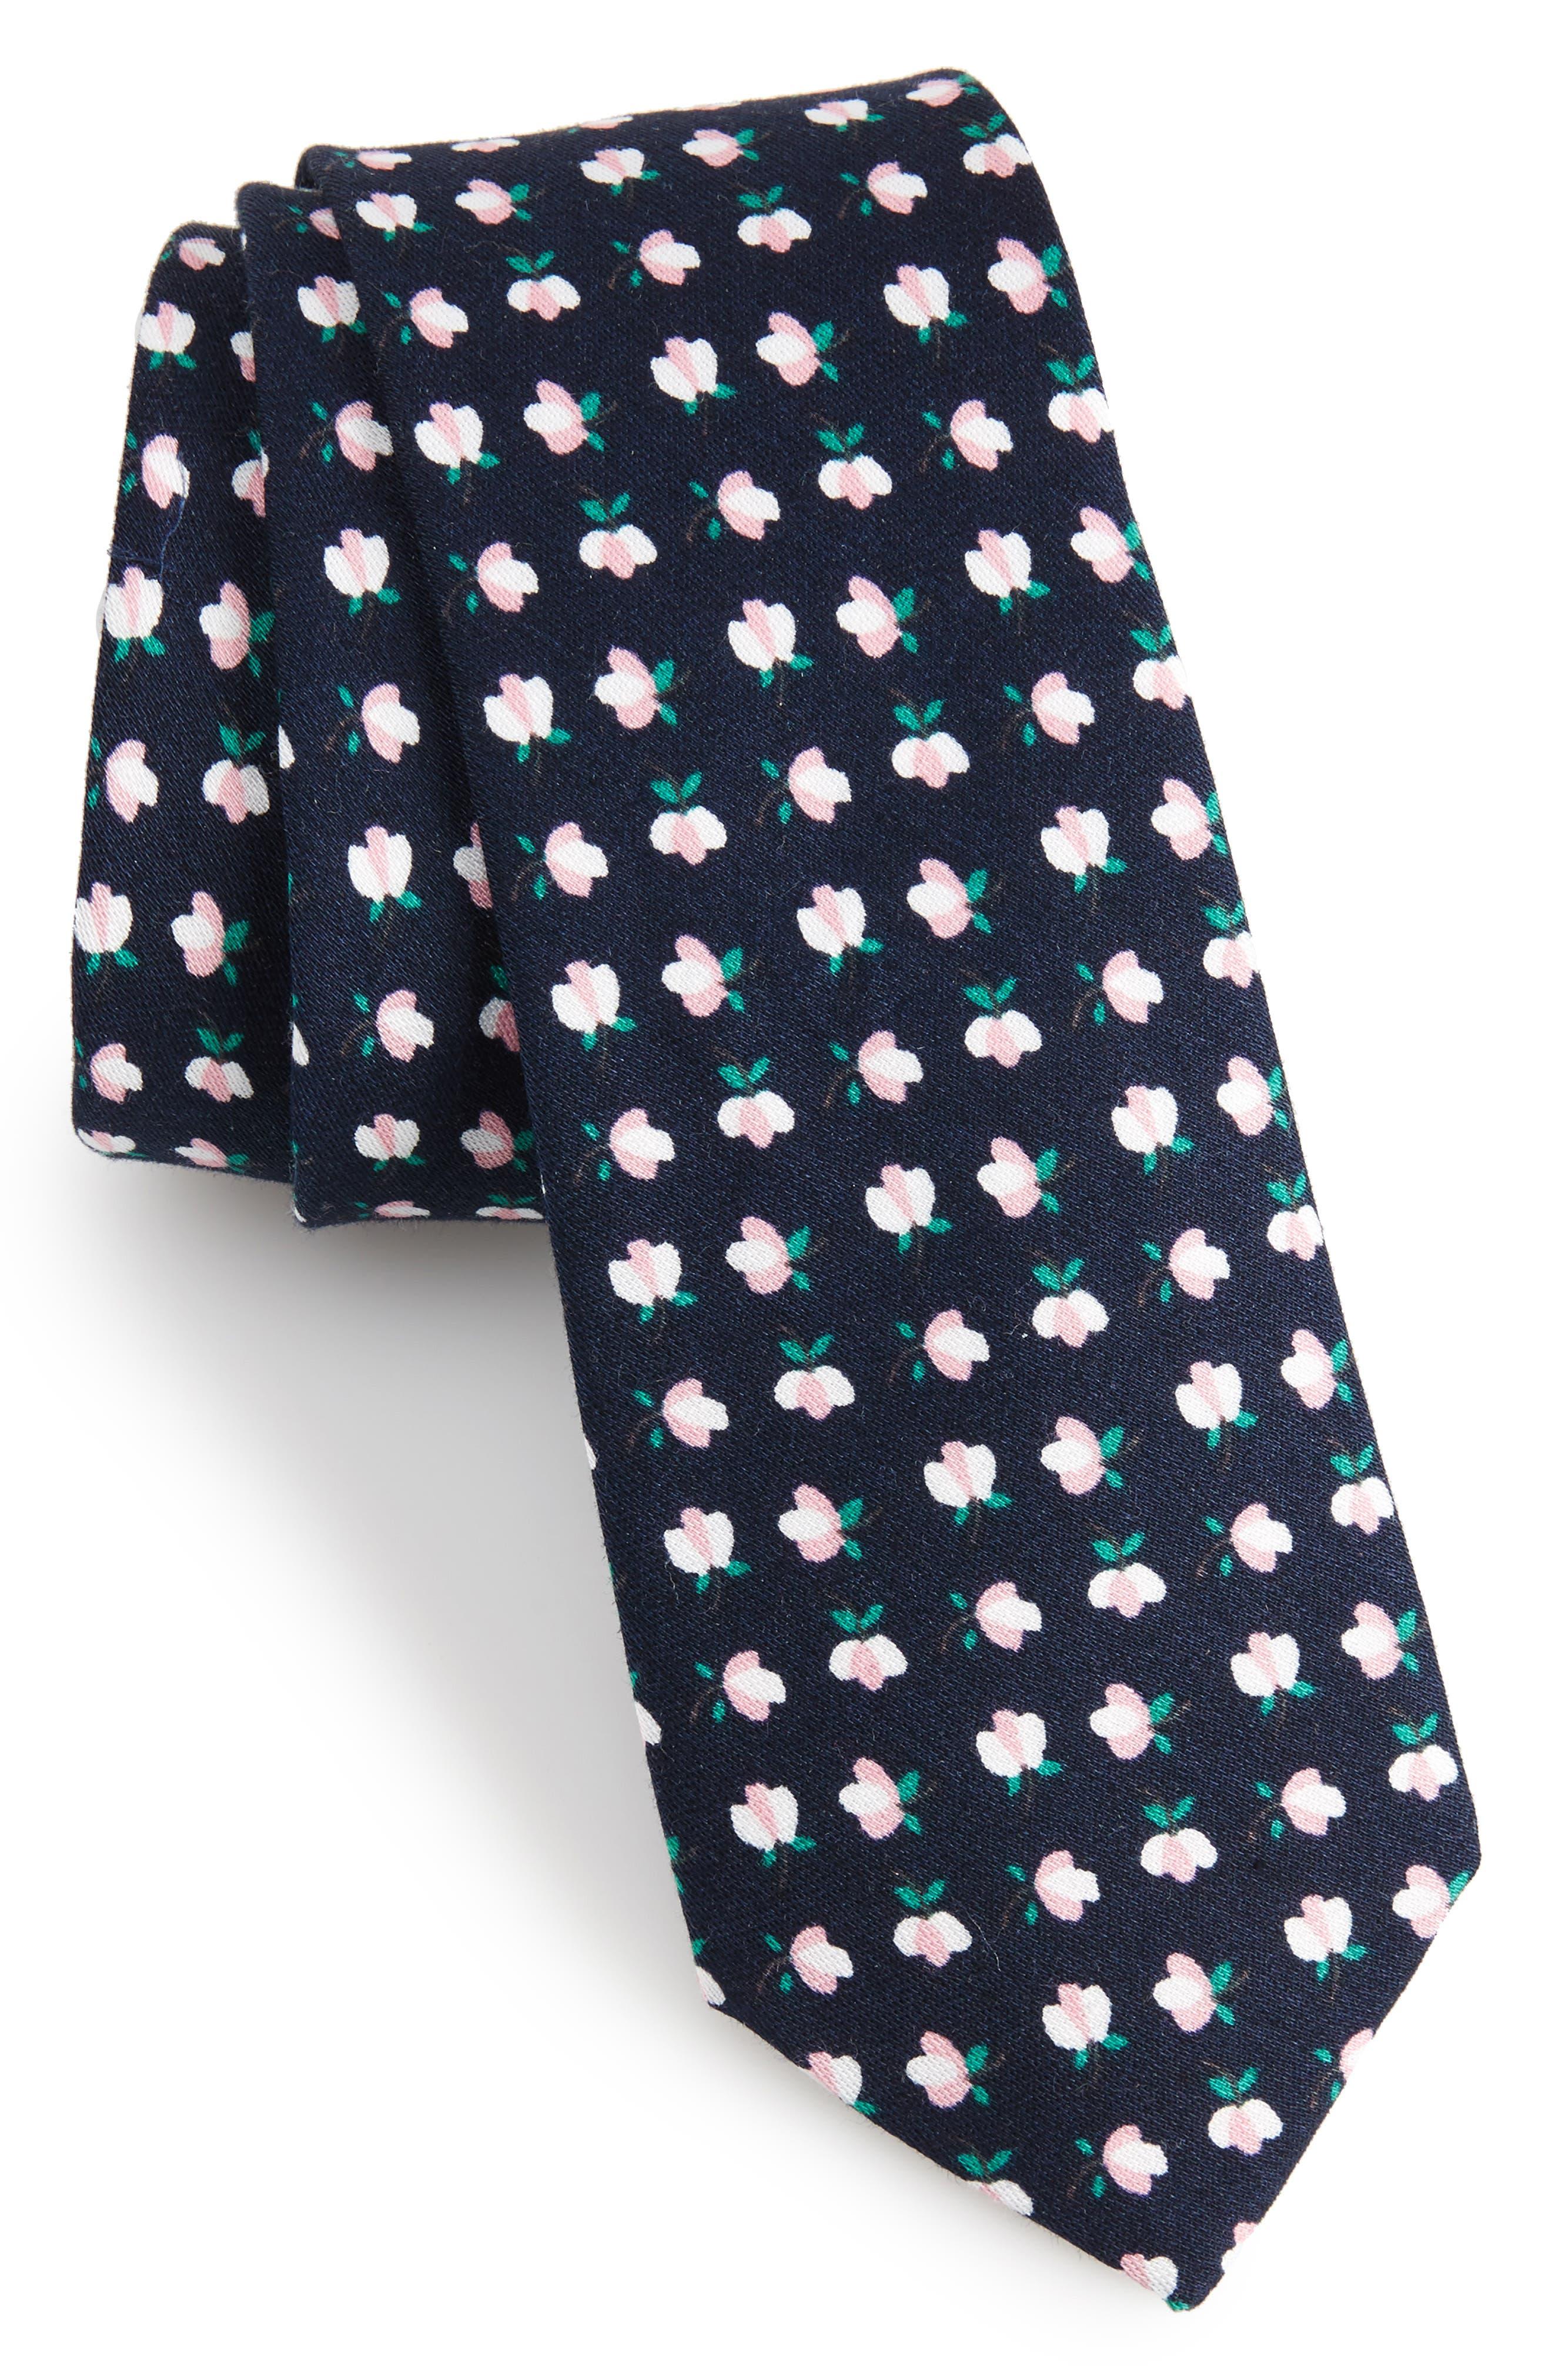 Rufford Mini Floral Cotton Tie,                             Main thumbnail 1, color,                             Navy